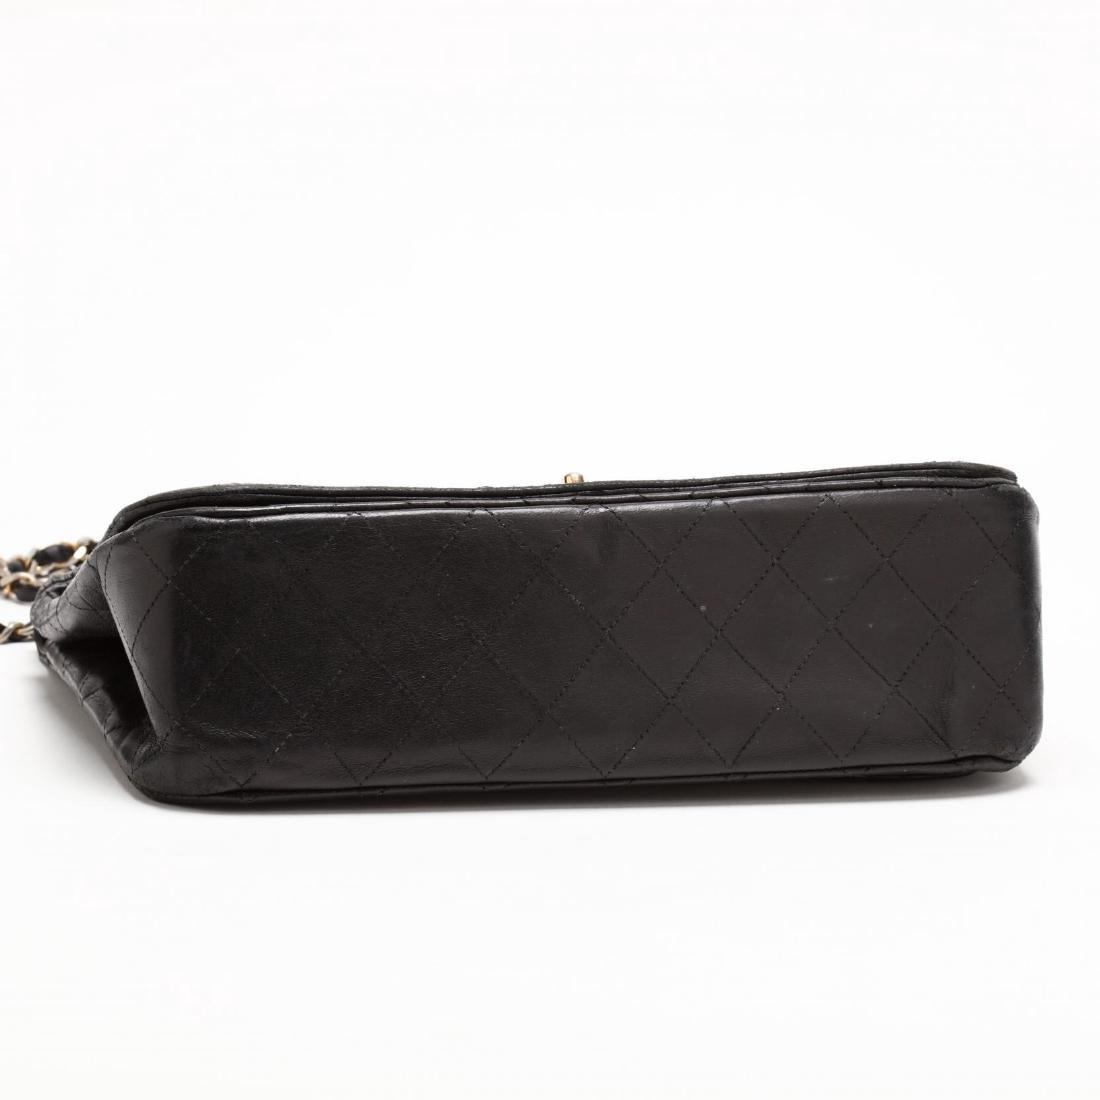 Vintage Full Flap Crossbody Bag, Chanel - 3